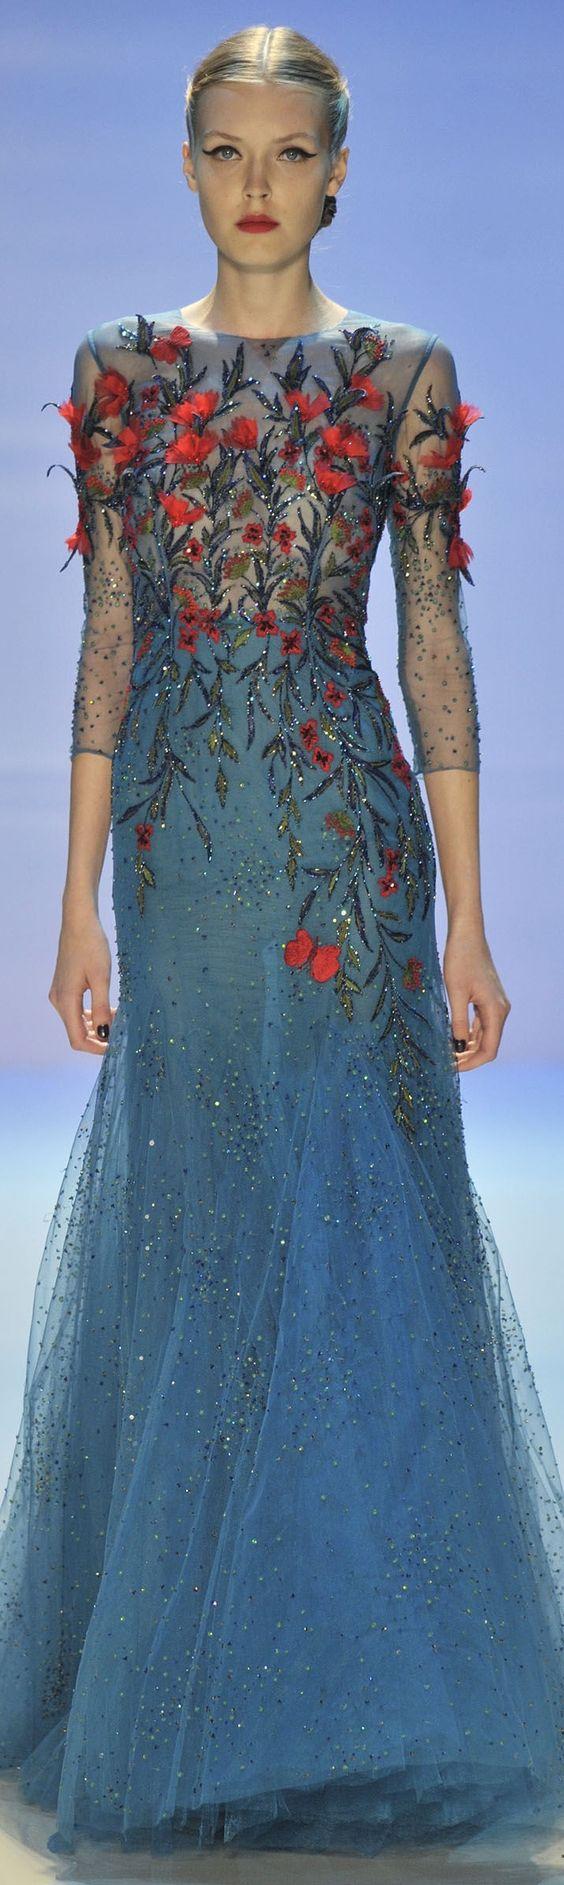 ** Inspiration de motifs ** Georges Hobeika Couture F/W 2014-2015